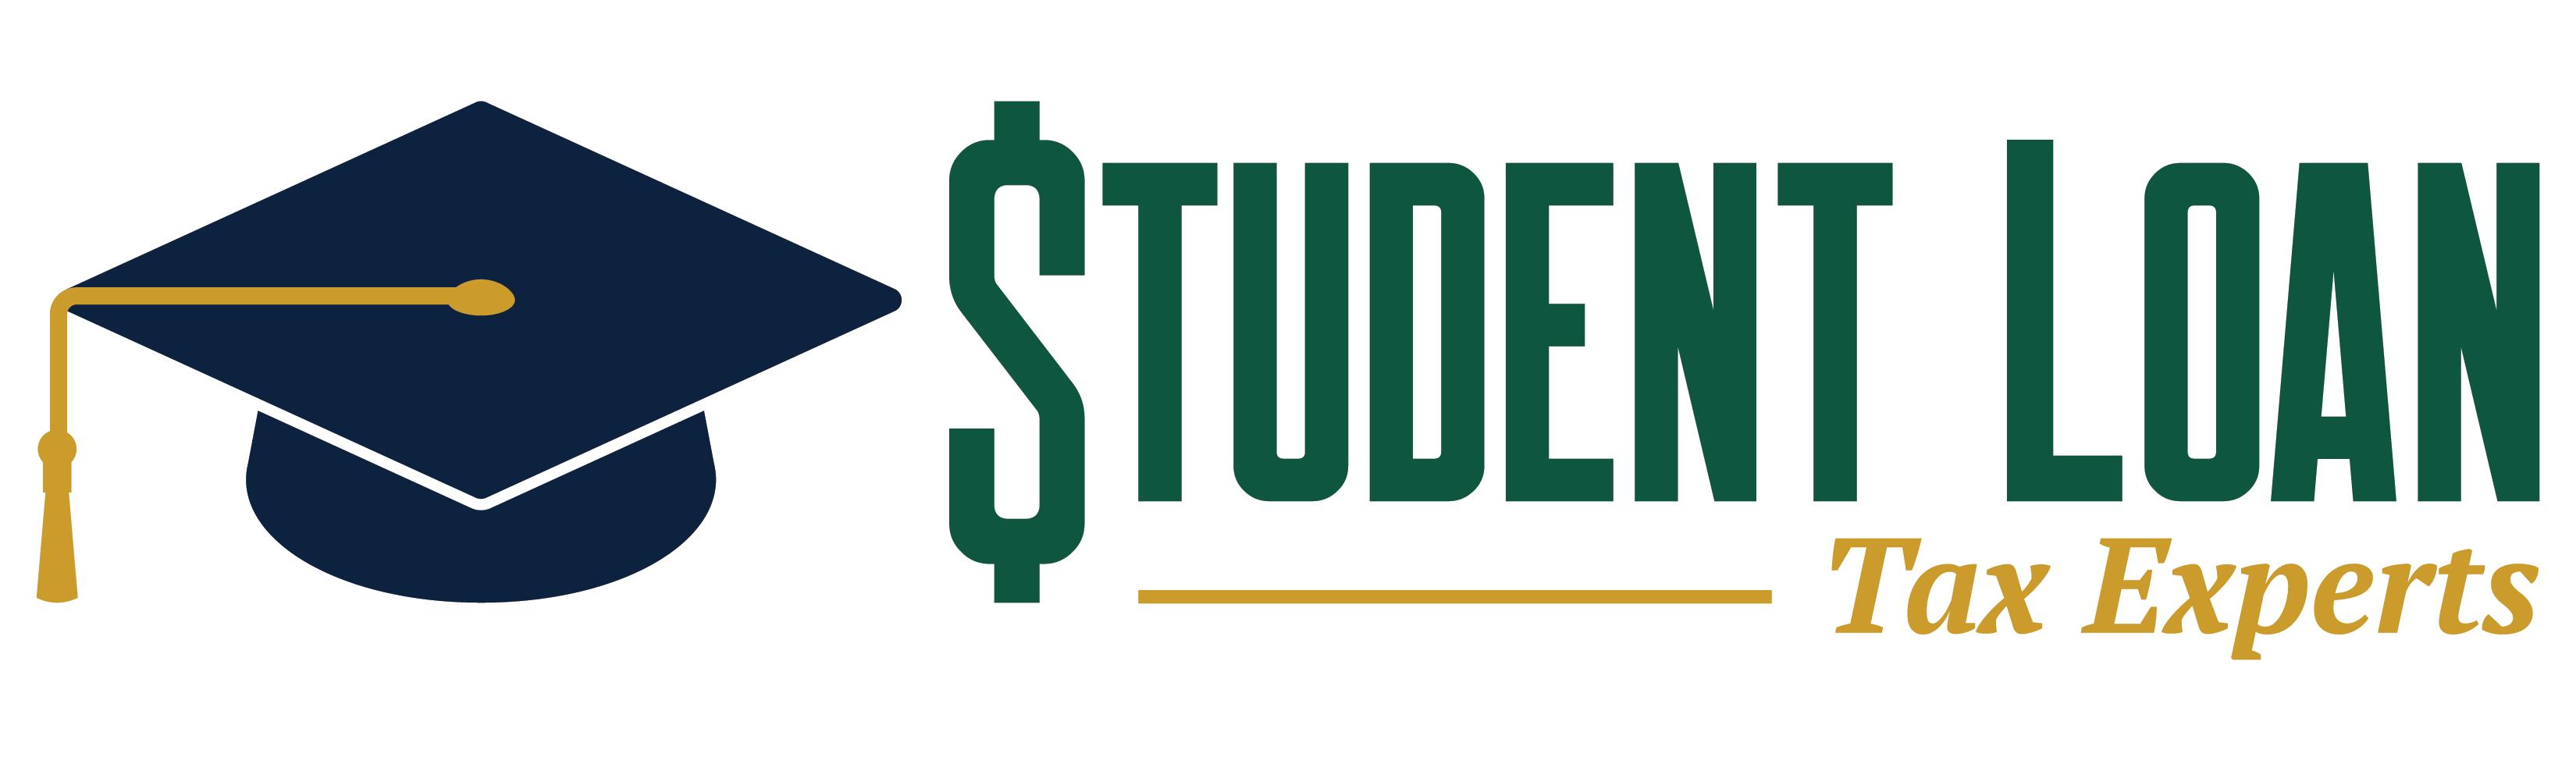 Student Loan Tax Experts